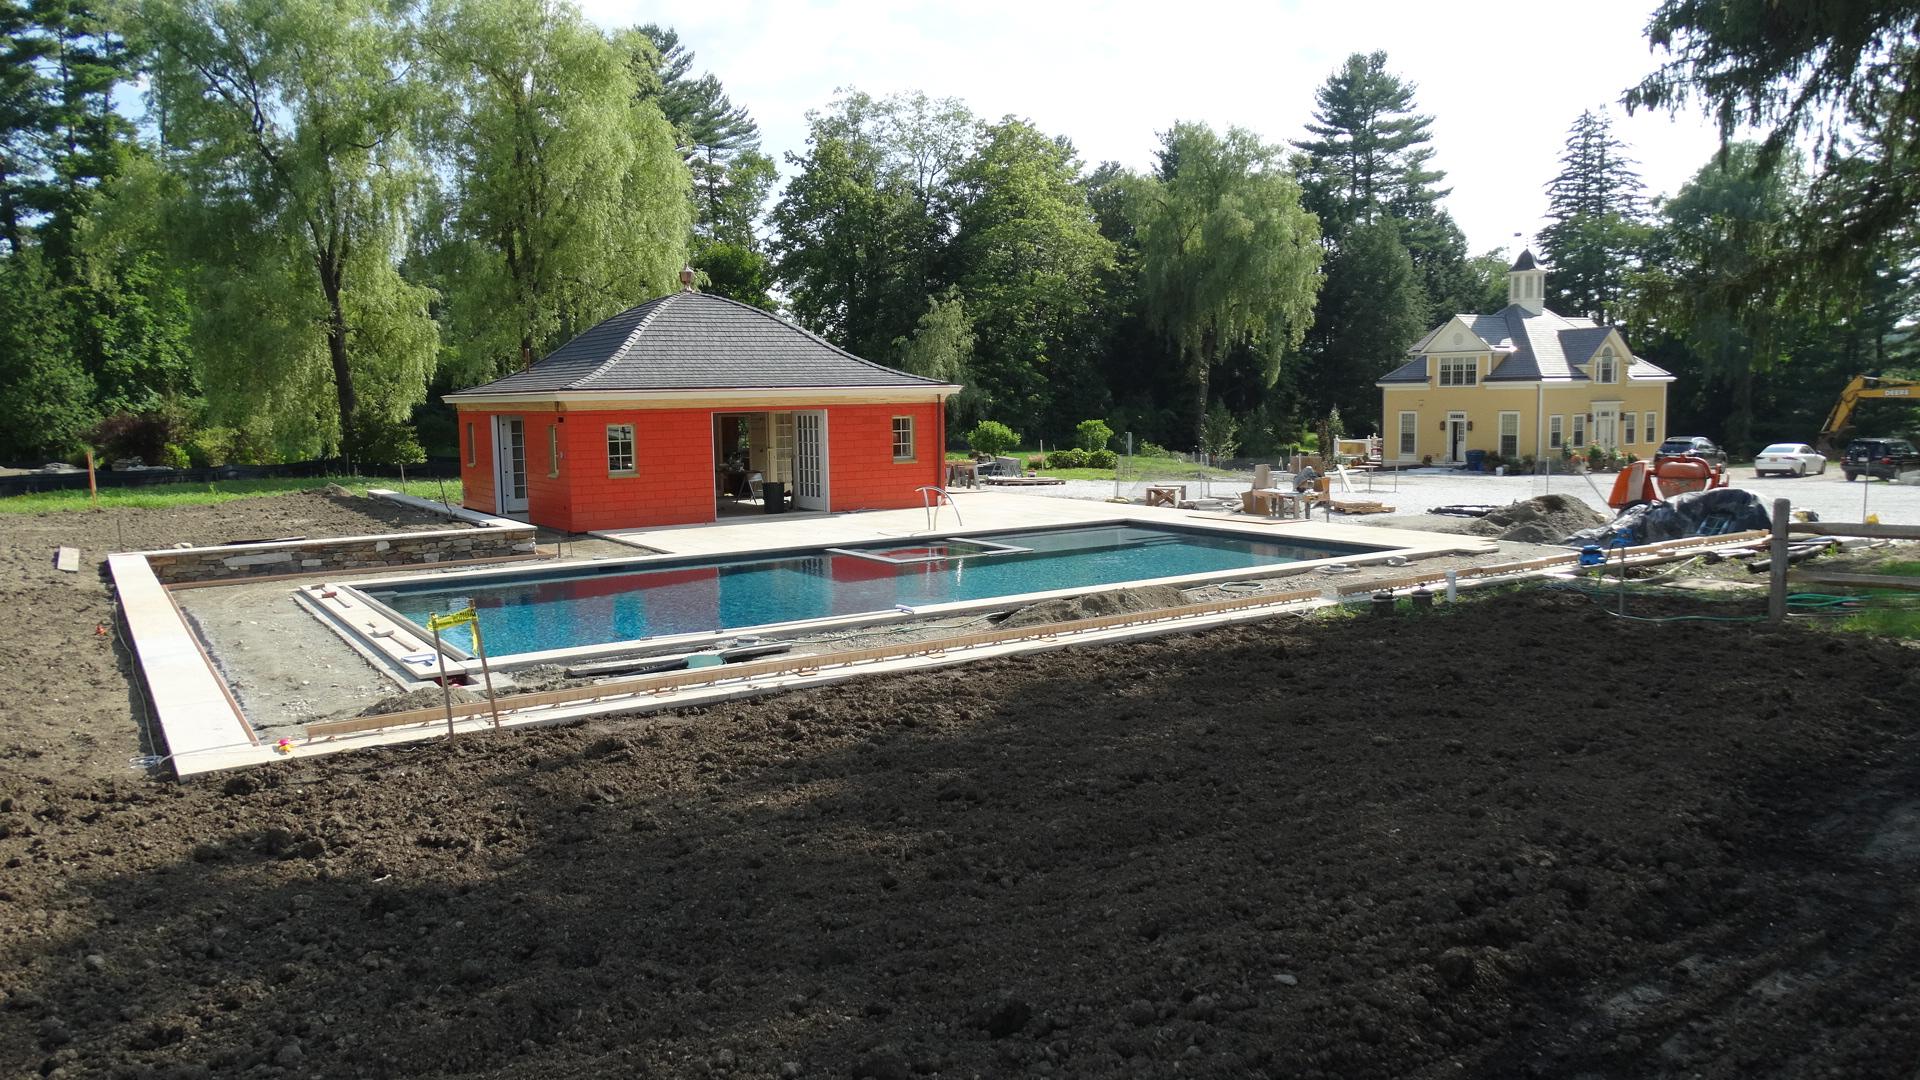 Linden Brook Farm pool under construction 25′ x 50′